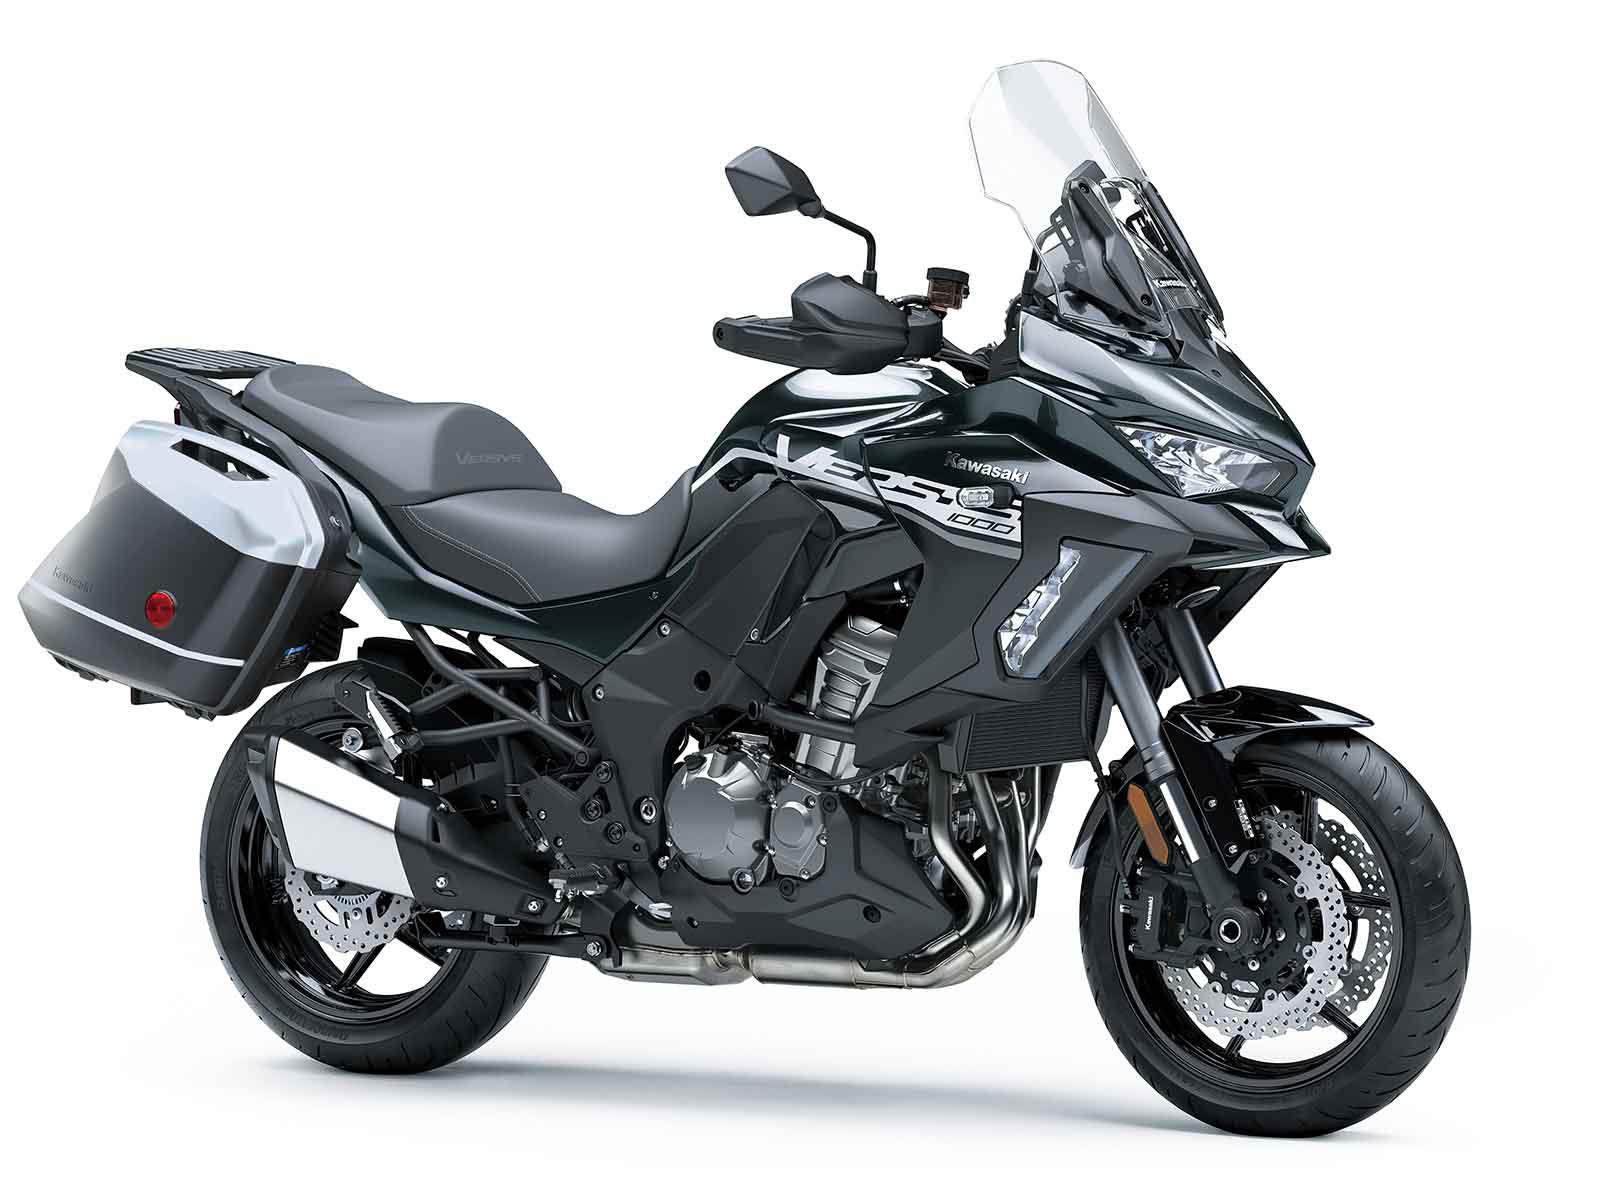 2020 Kawasaki Versys 1000 ABS LT SE